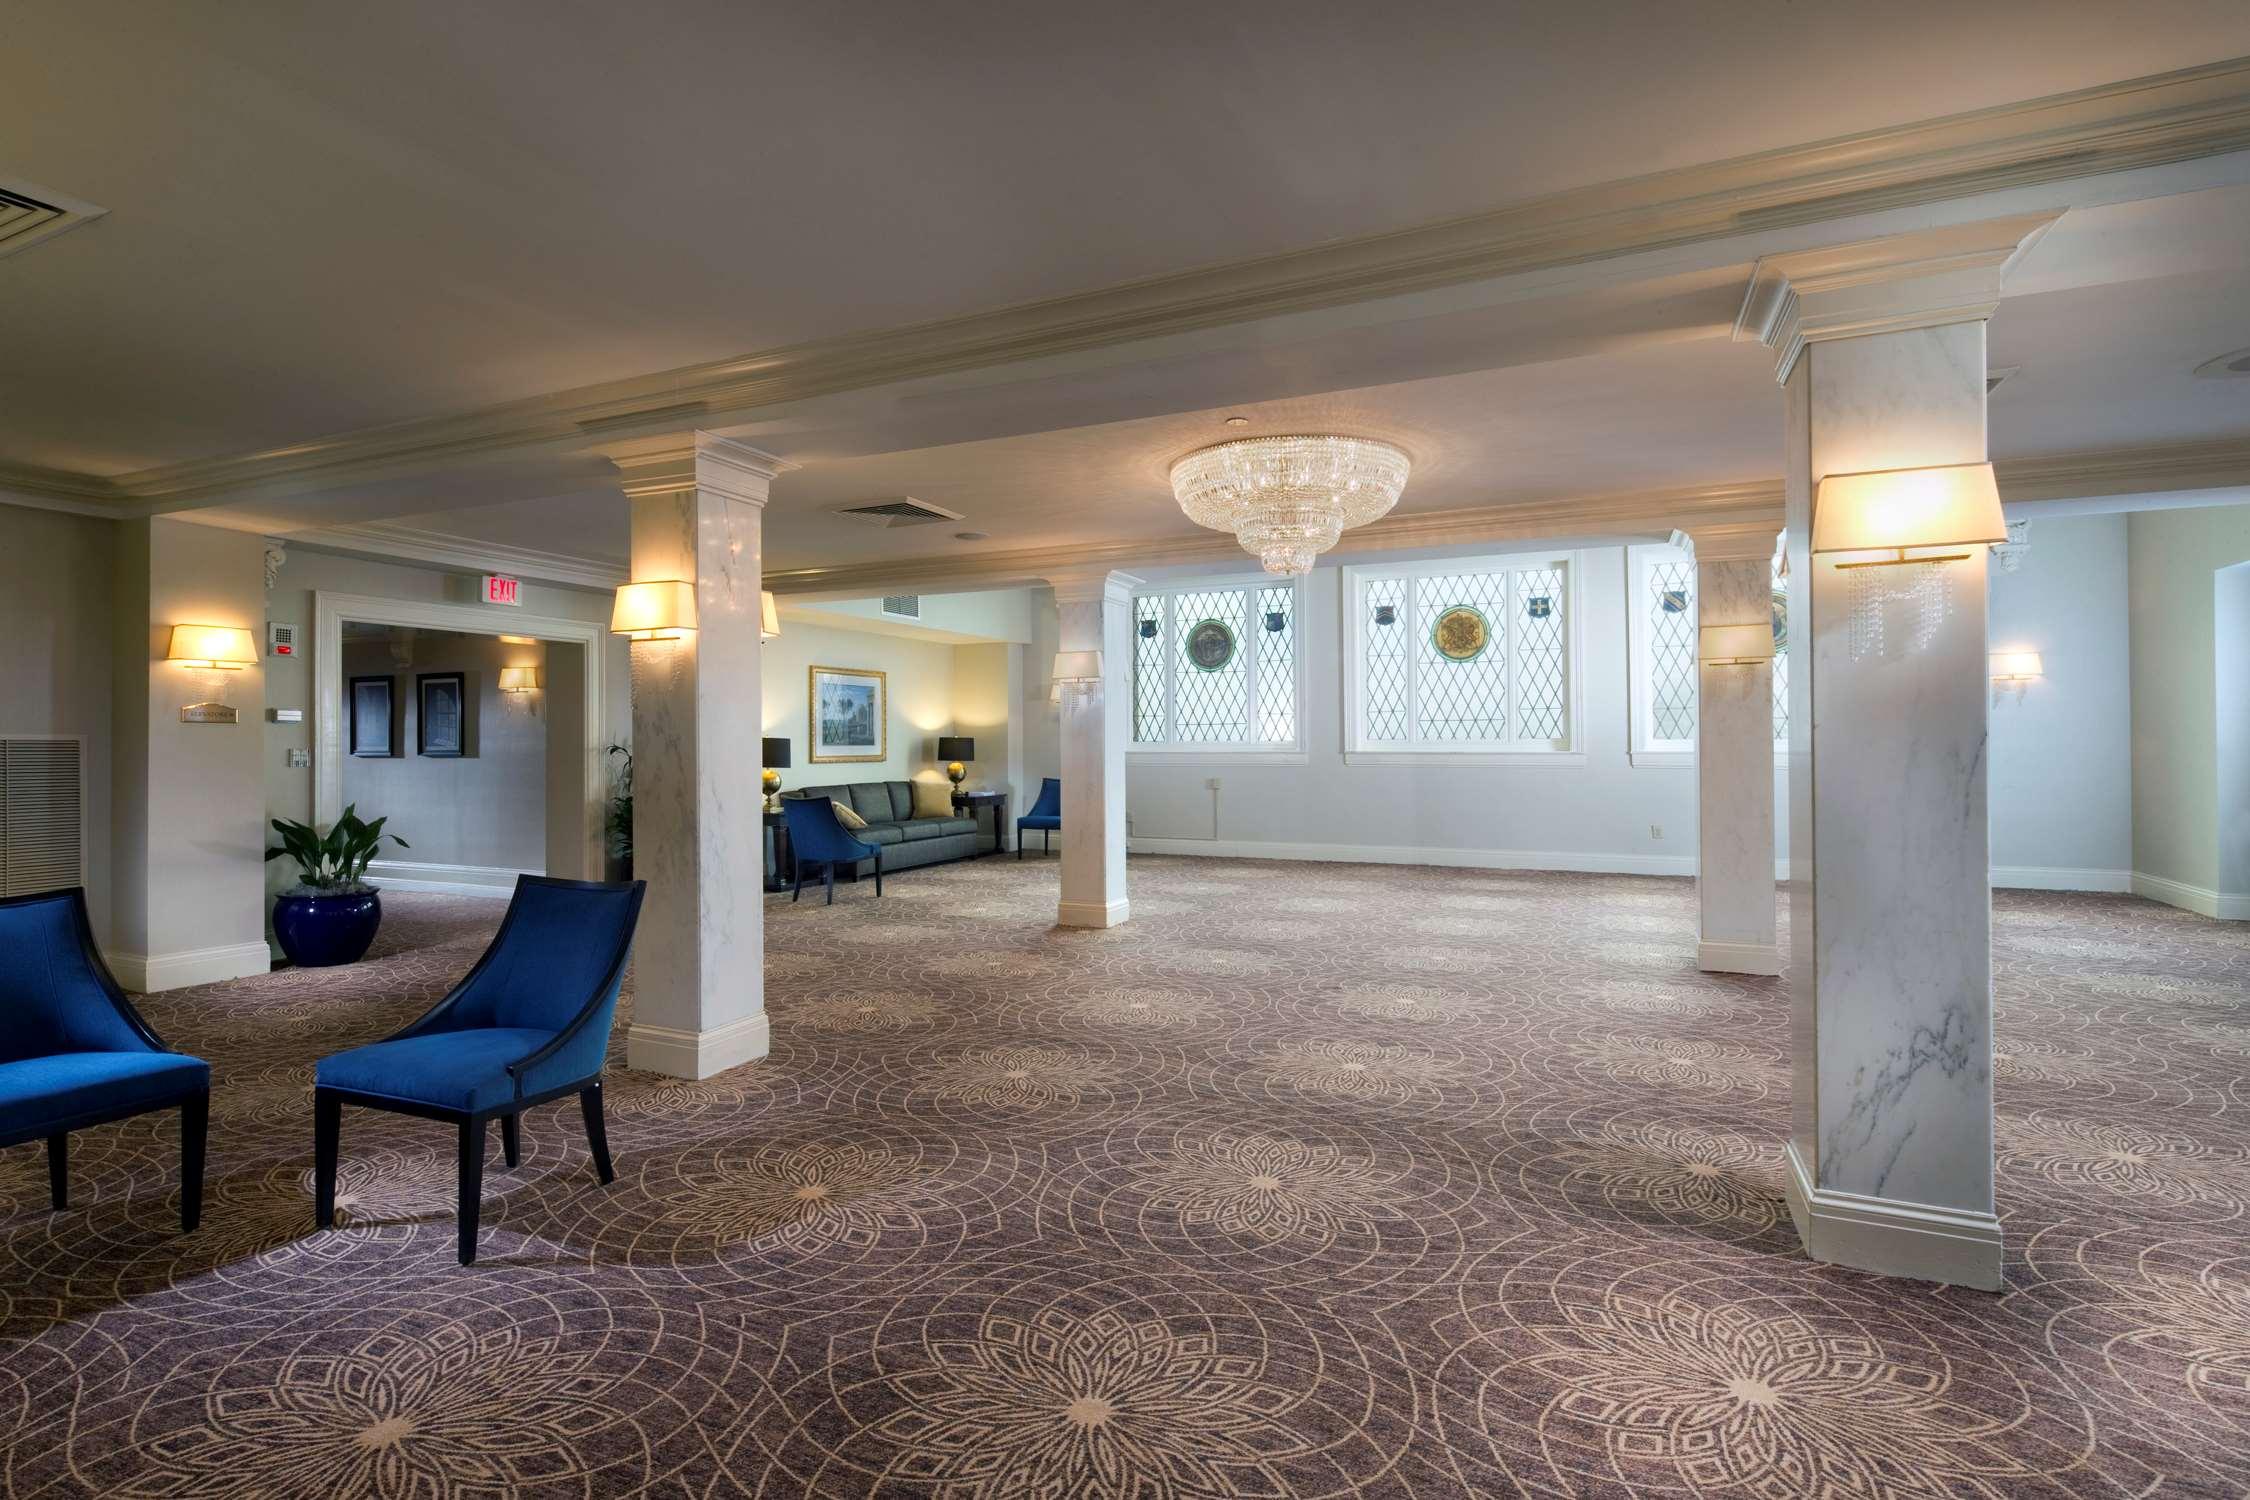 The Seelbach Hilton Louisville image 10